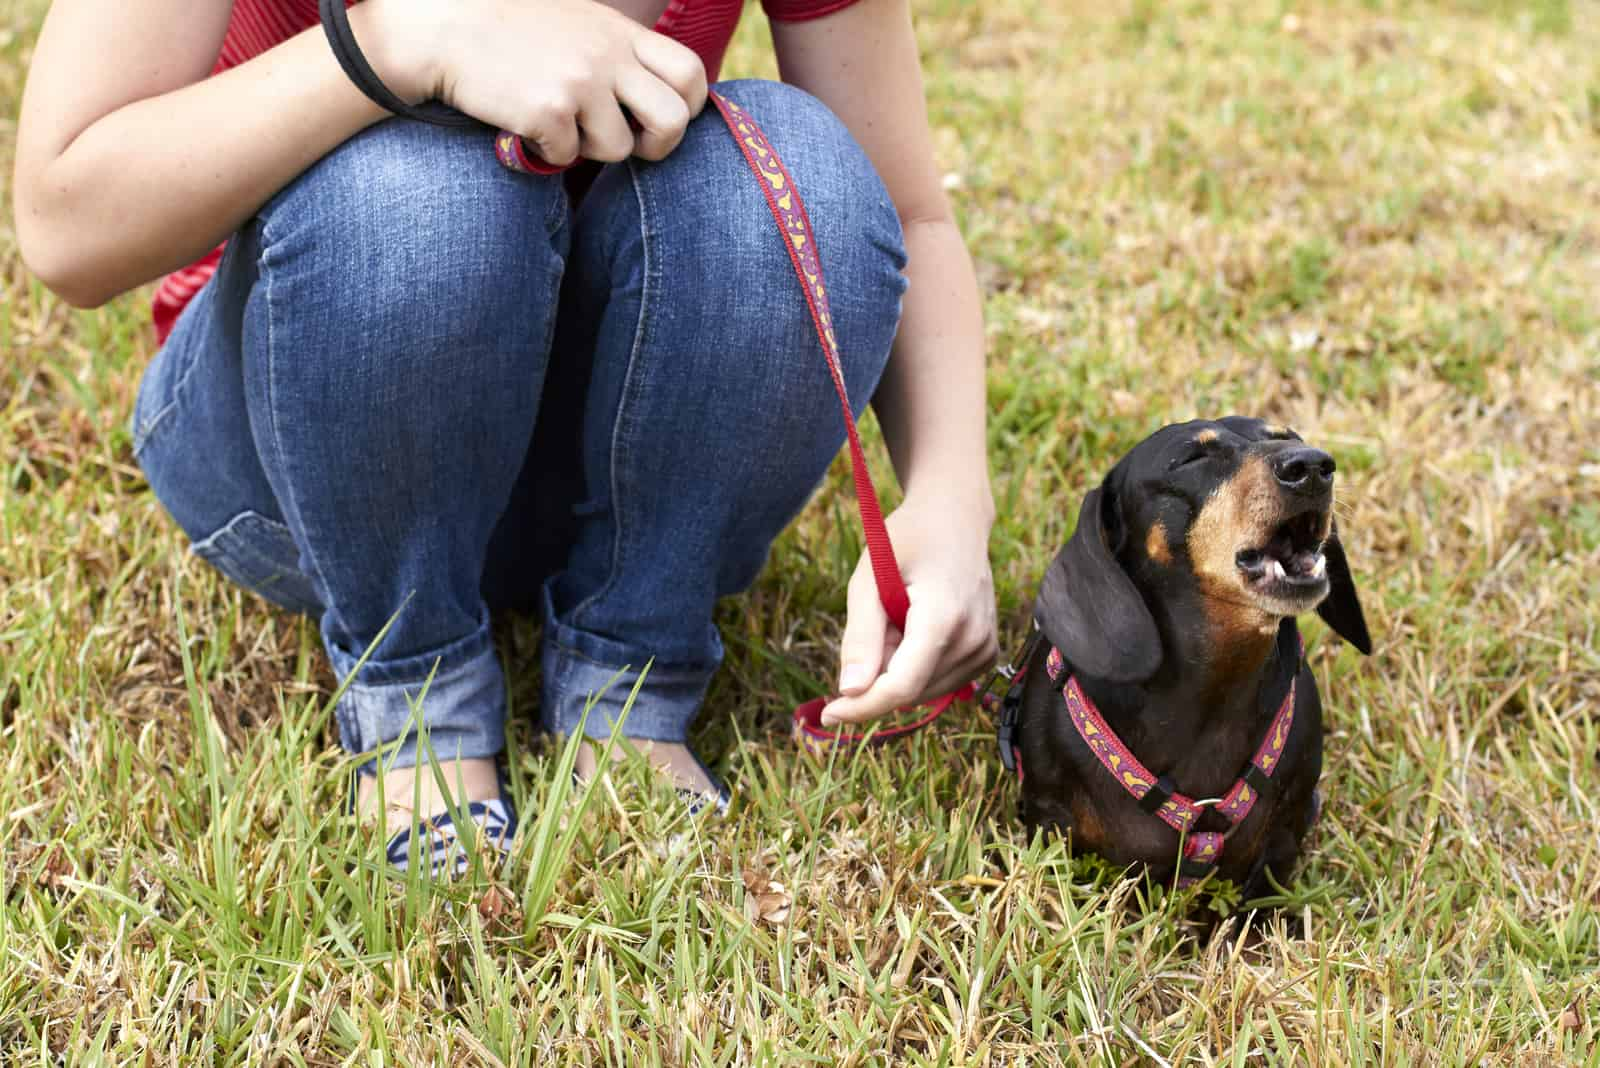 Barking Dachshund dog sitting beside owner